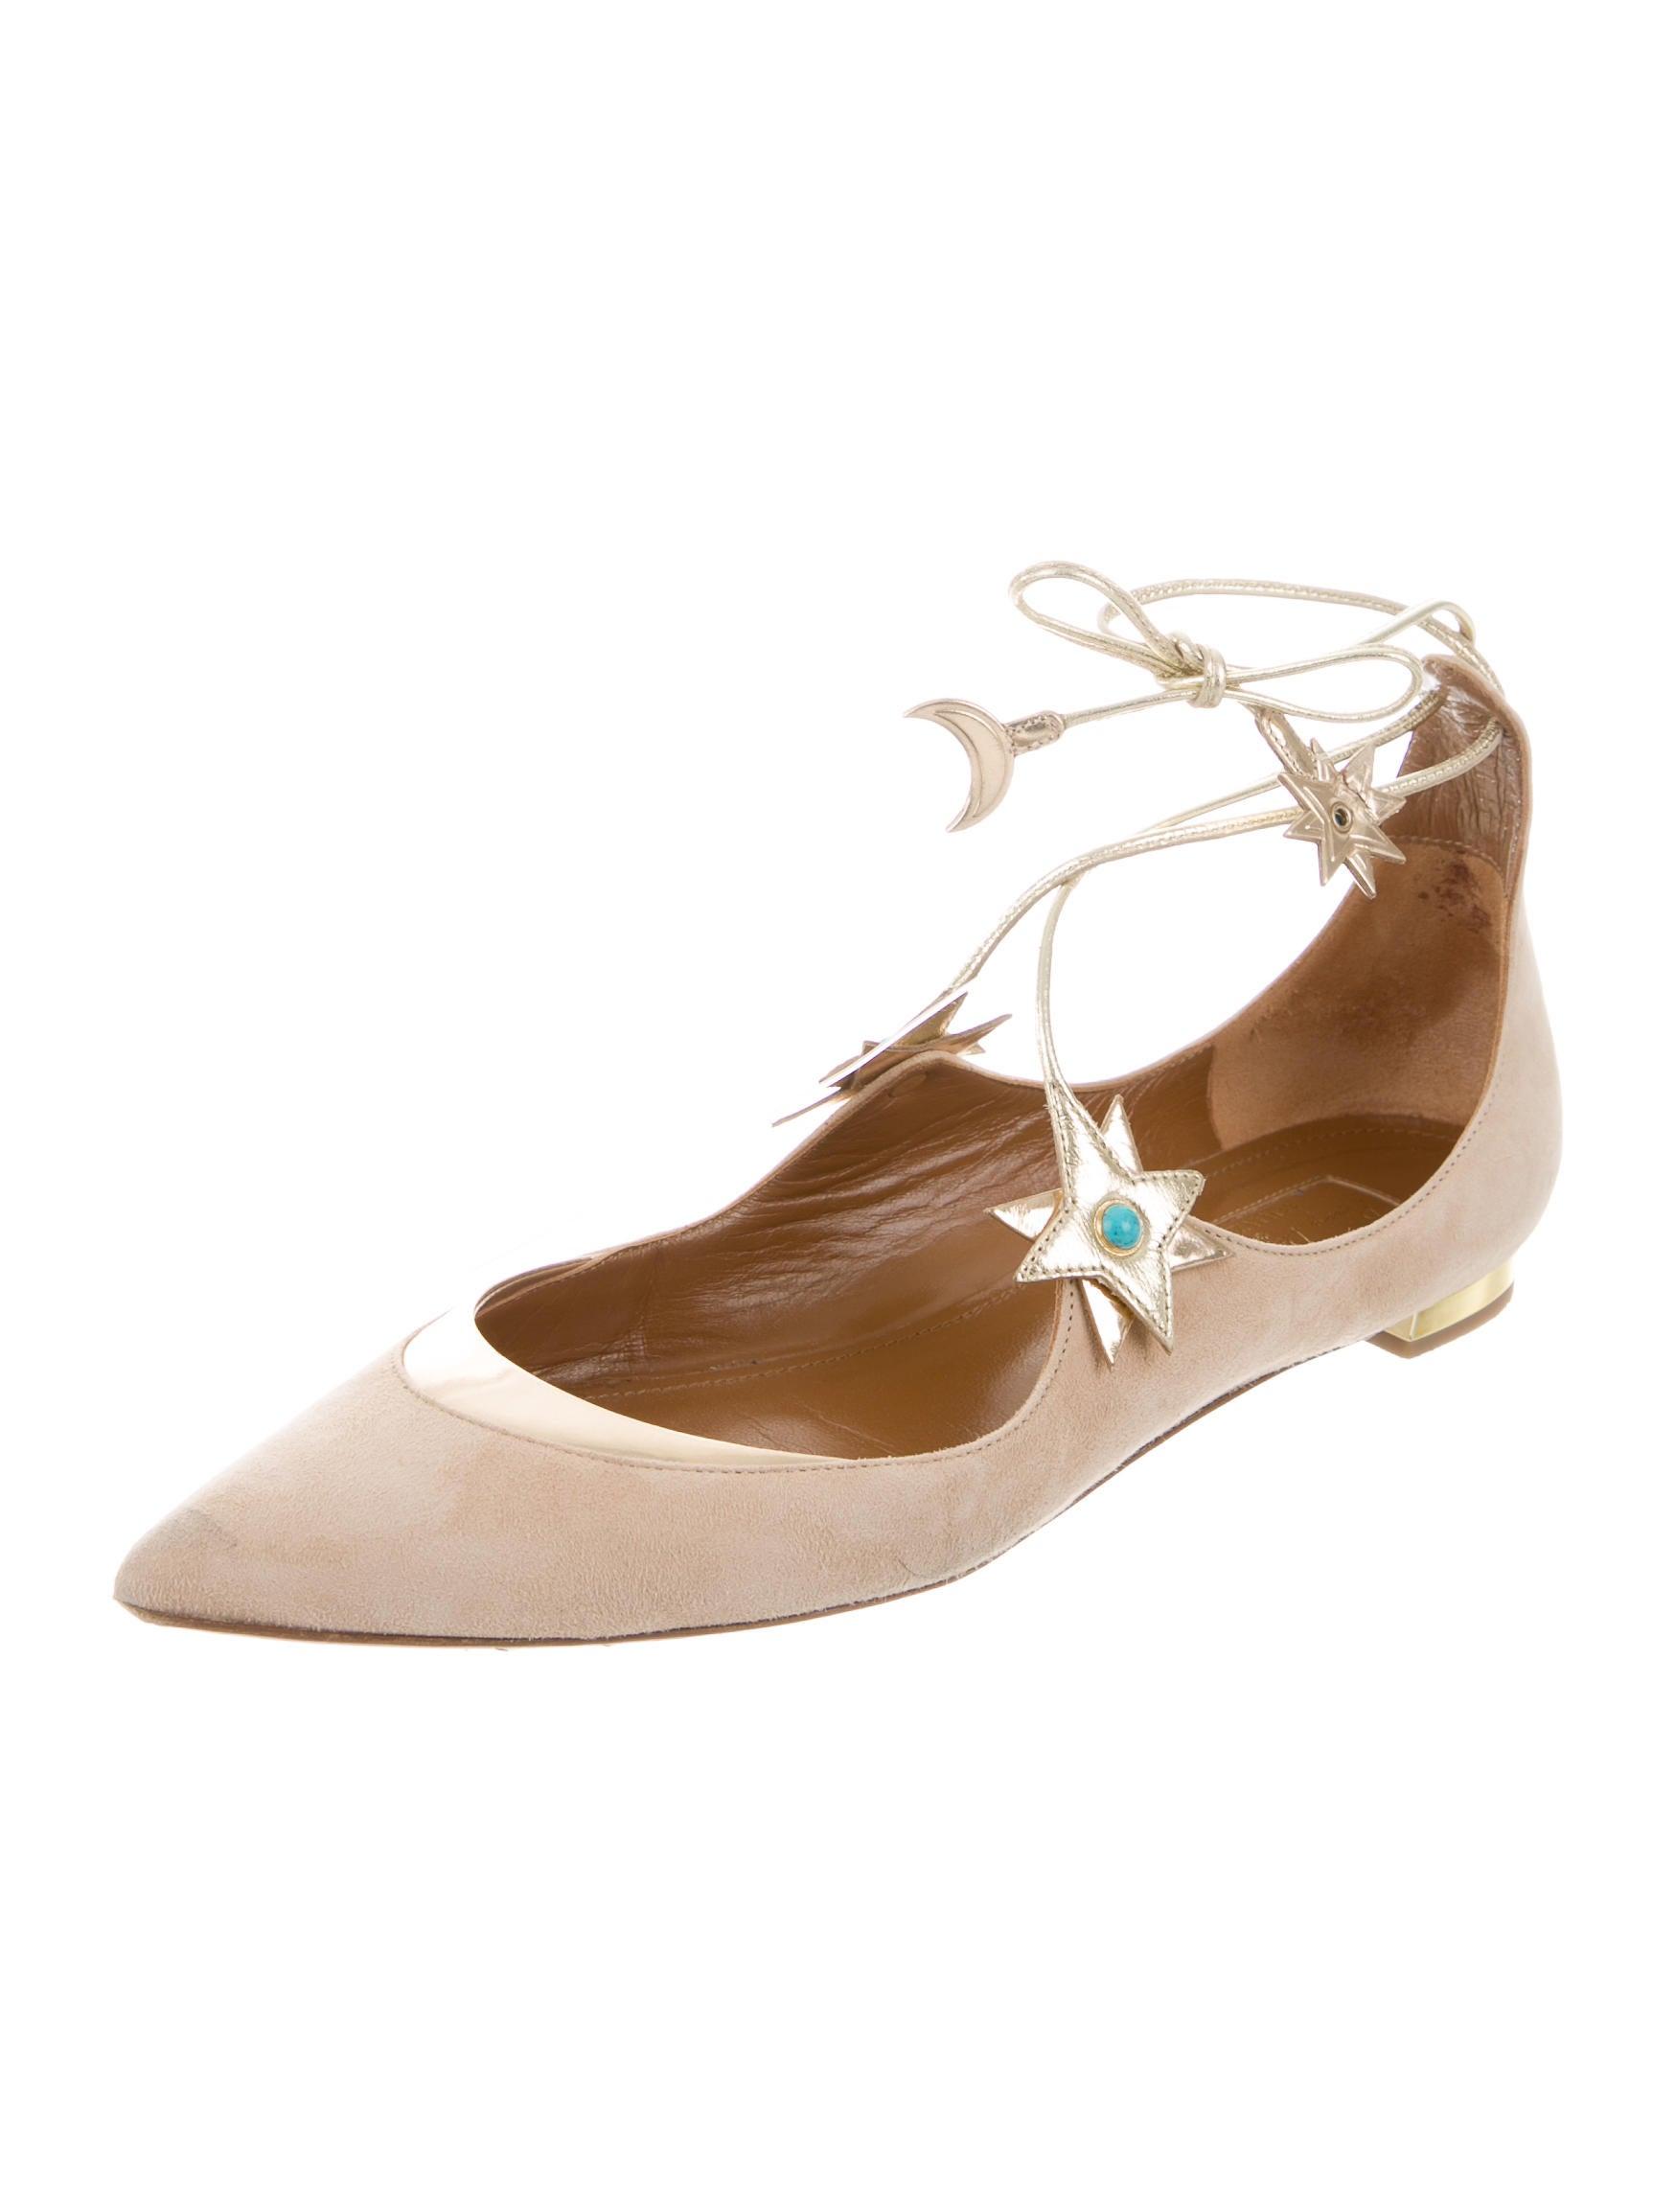 Poppy Delevingne and Aquazzura Team Up to Design Shoes Poppy Delevingne and Aquazzura Team Up to Design Shoes new pics